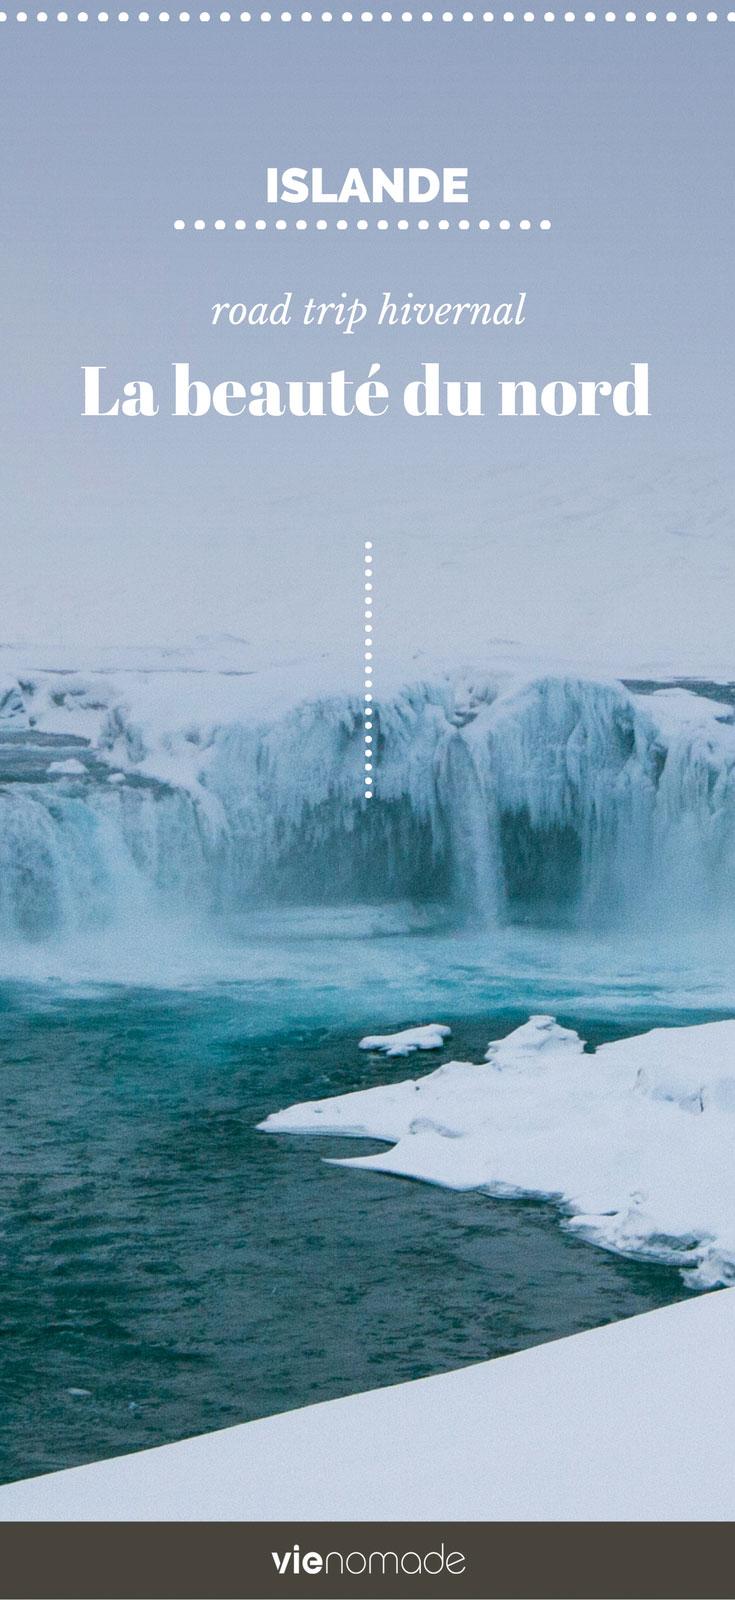 Road trip dans le nord de l'Islande: Akureyri, Myvatn, etc.